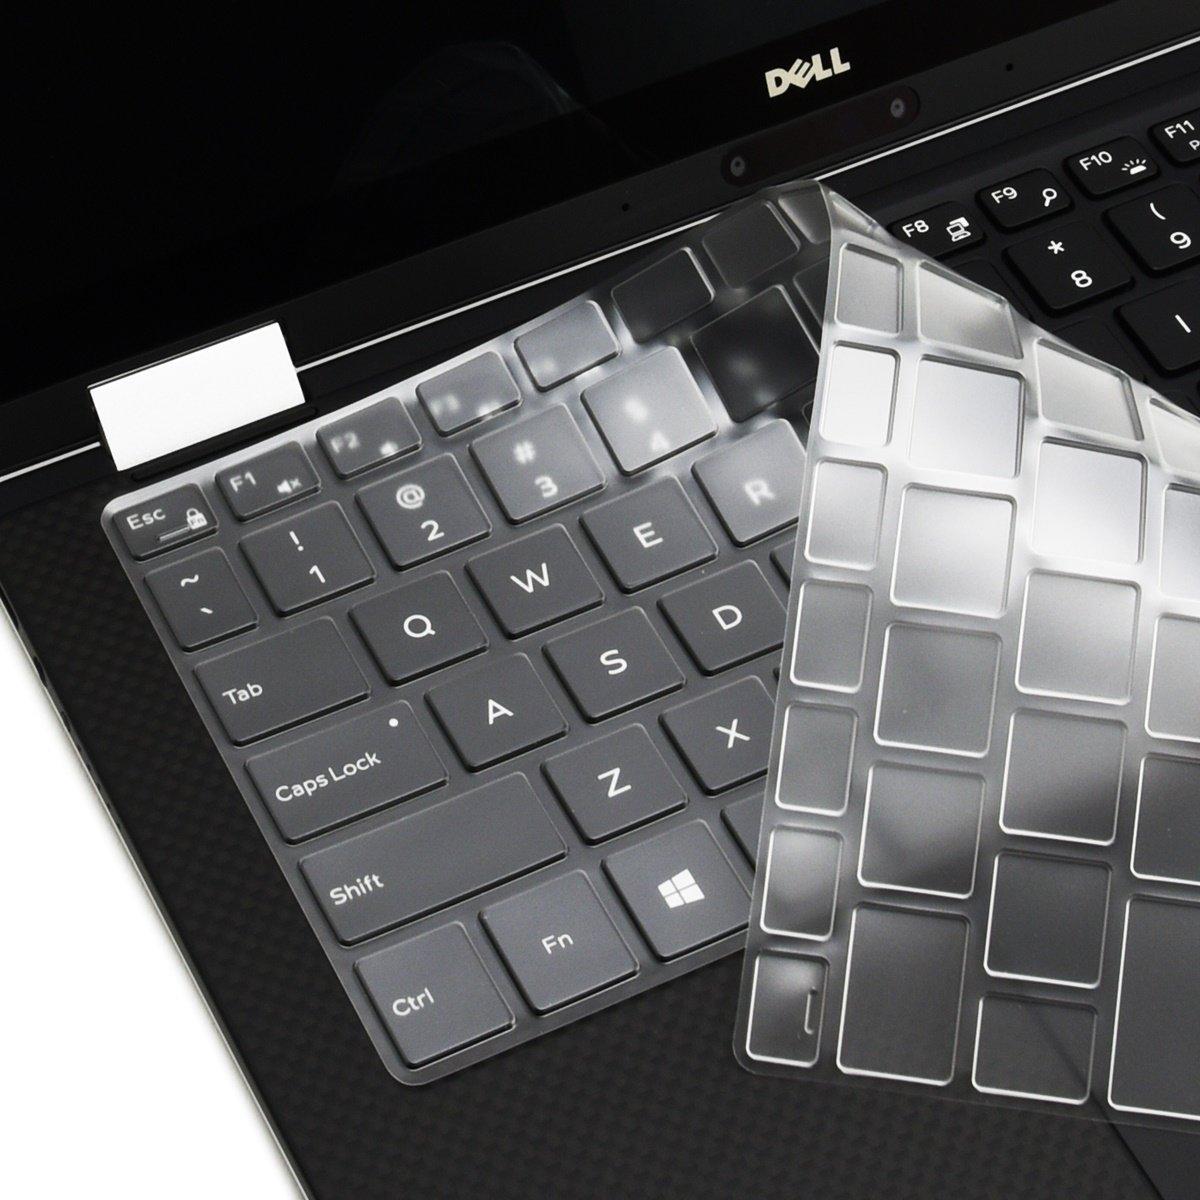 Folox® Waterproof Ultra Thin TPU Keyboard Protector Cover Skin for Dell  Latitude E6420,E6320,E5430,E6330,E6440